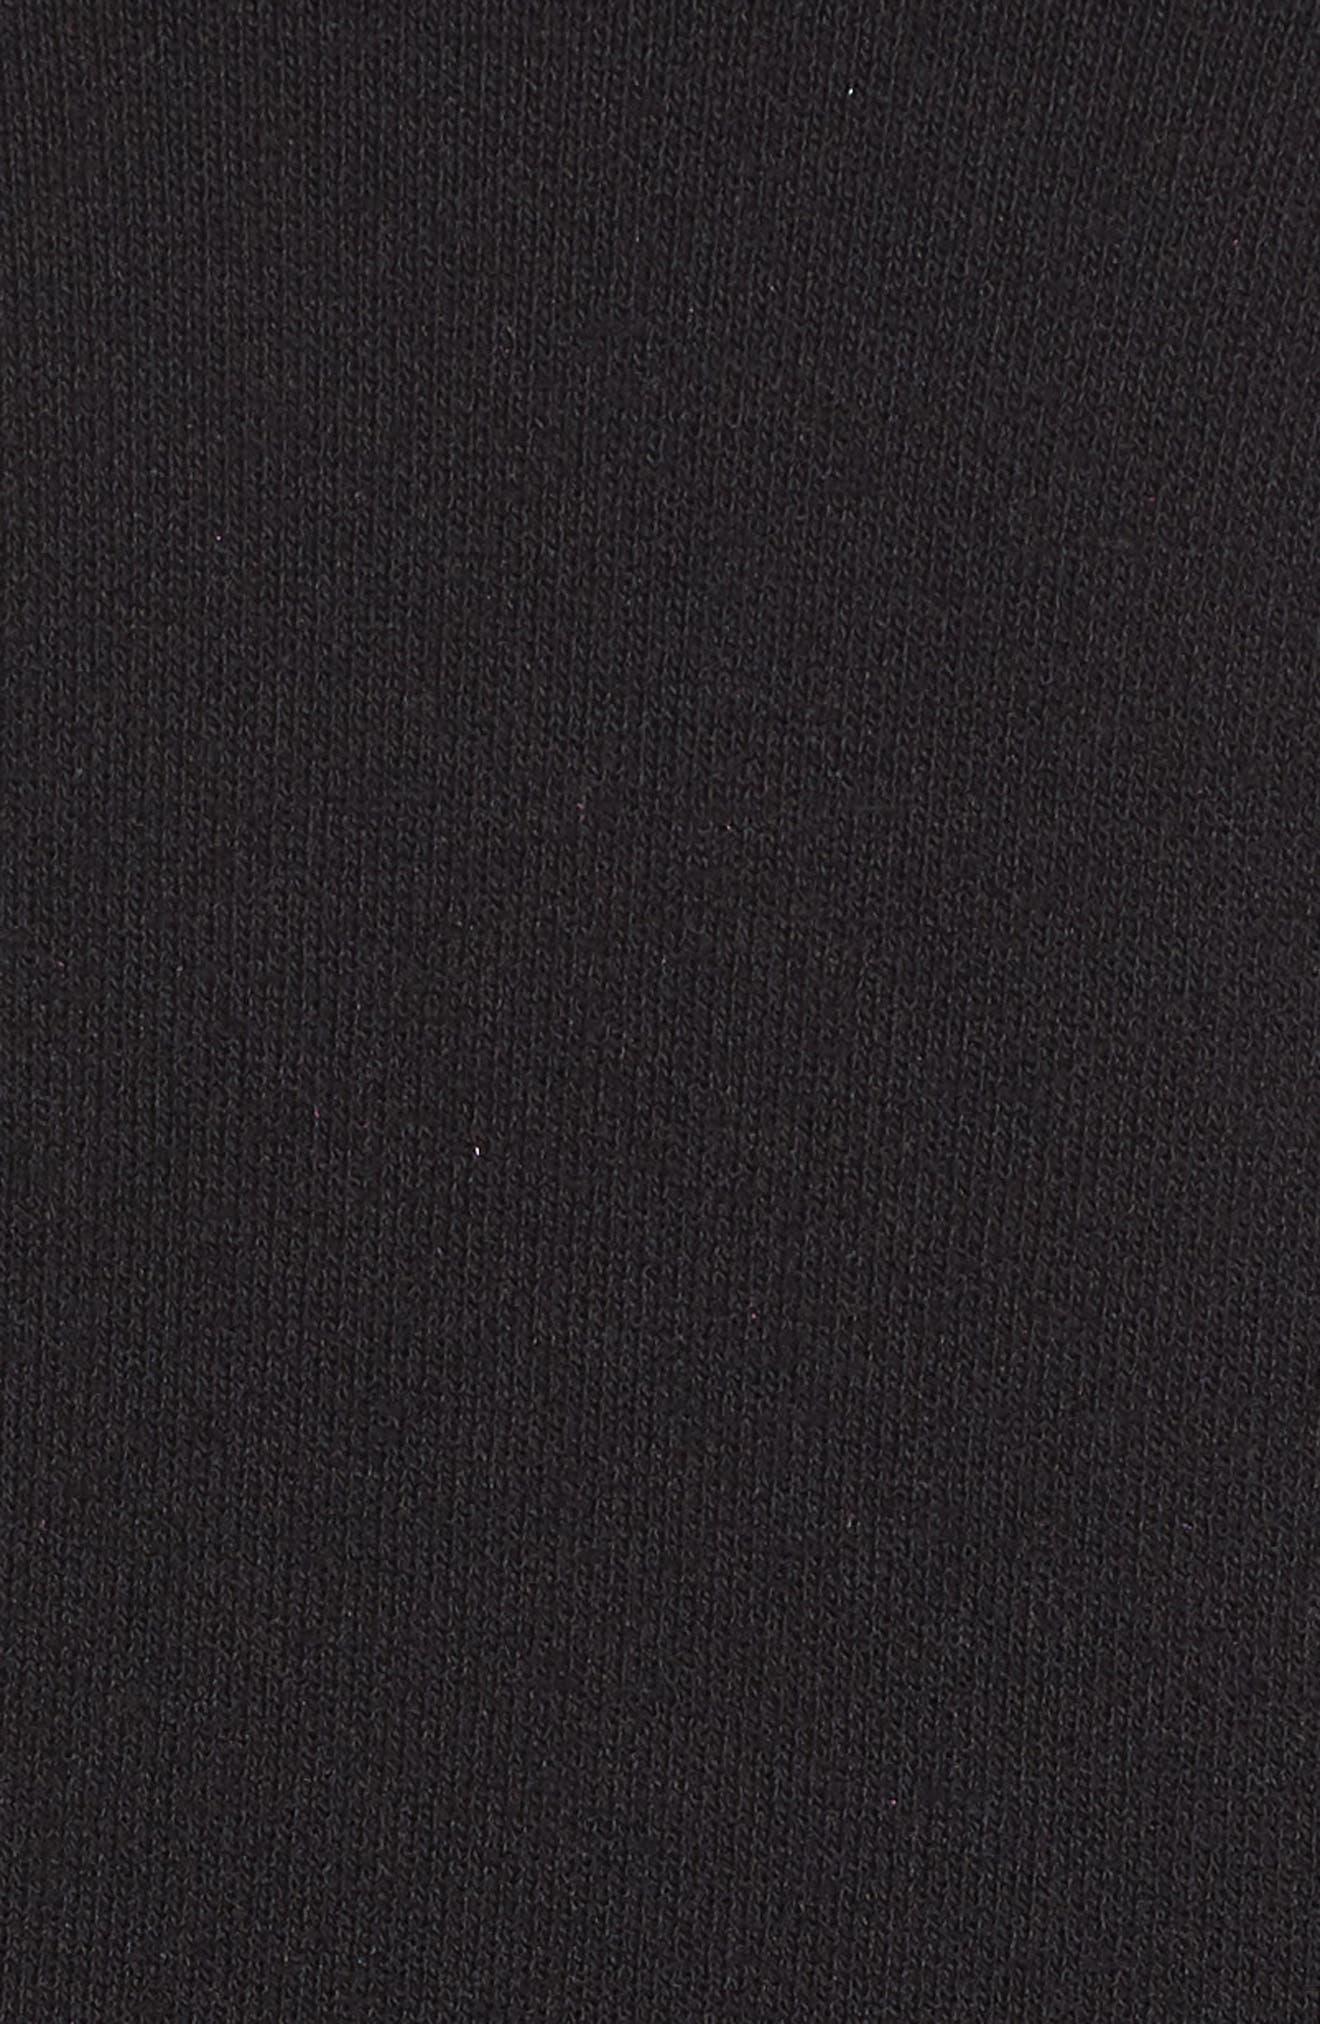 Off the Shoulder Flounce Hem Sweater Dress,                             Alternate thumbnail 6, color,                             001